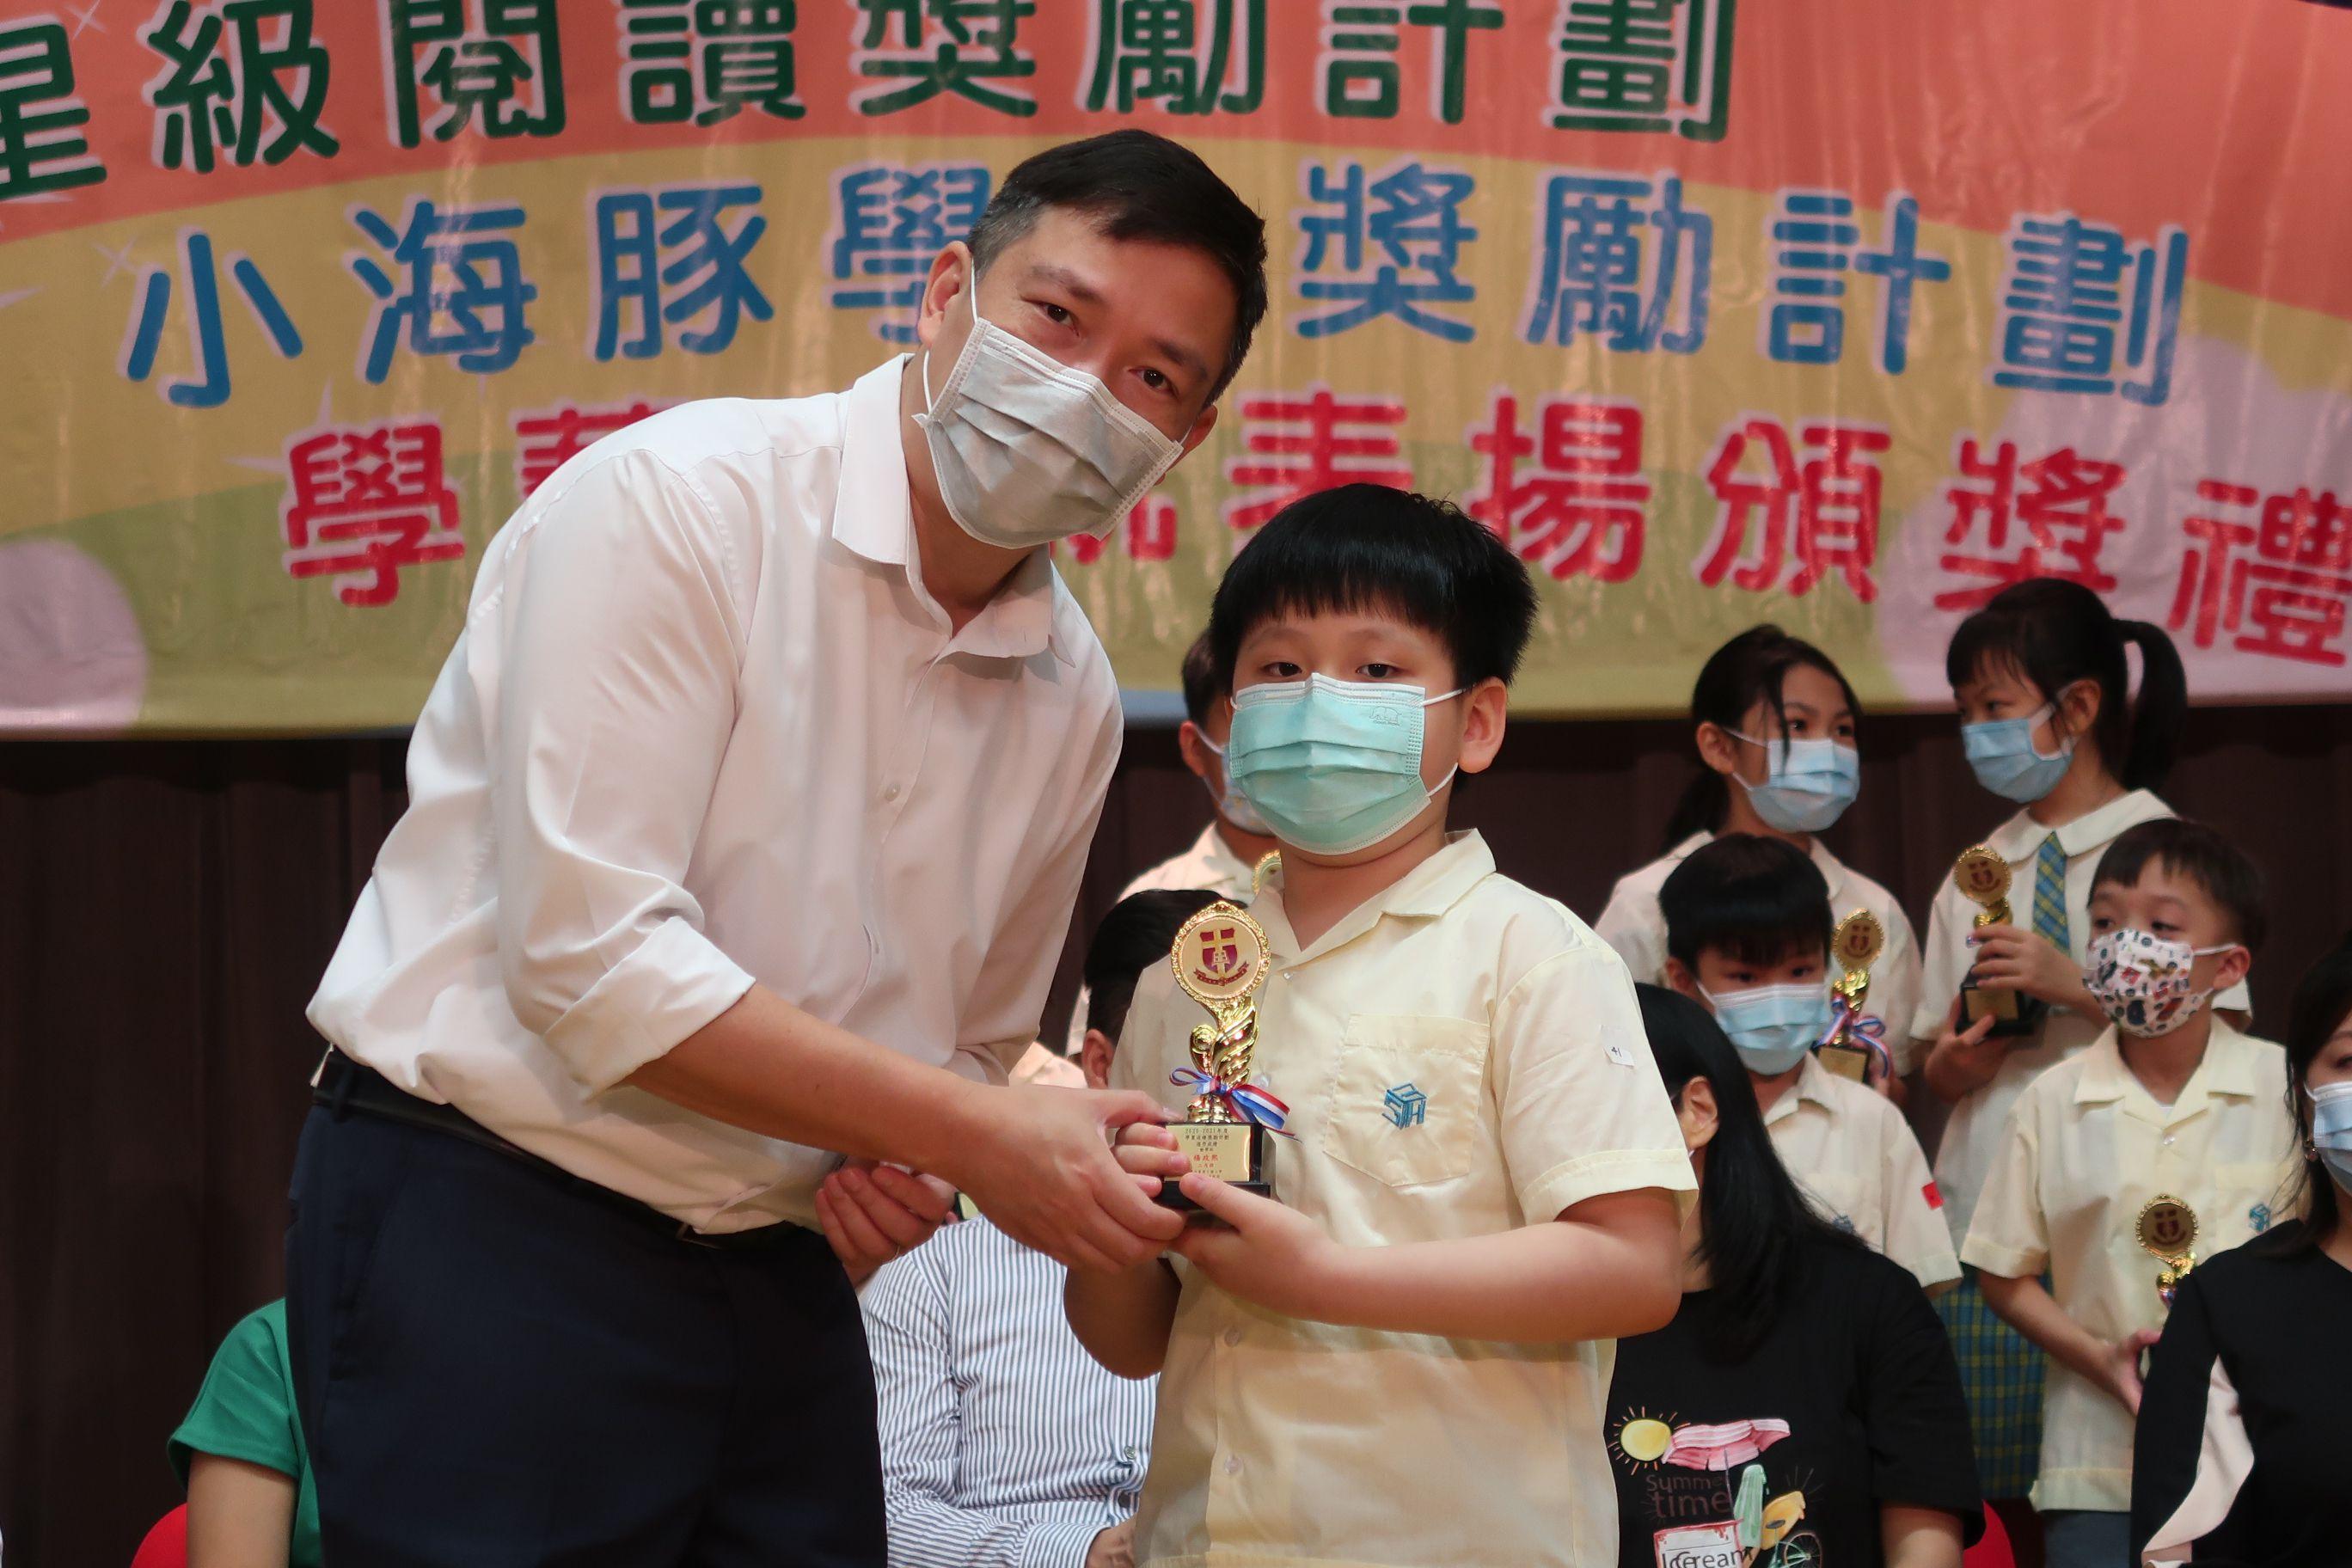 https://syh.edu.hk/sites/default/files/img_5665.jpg